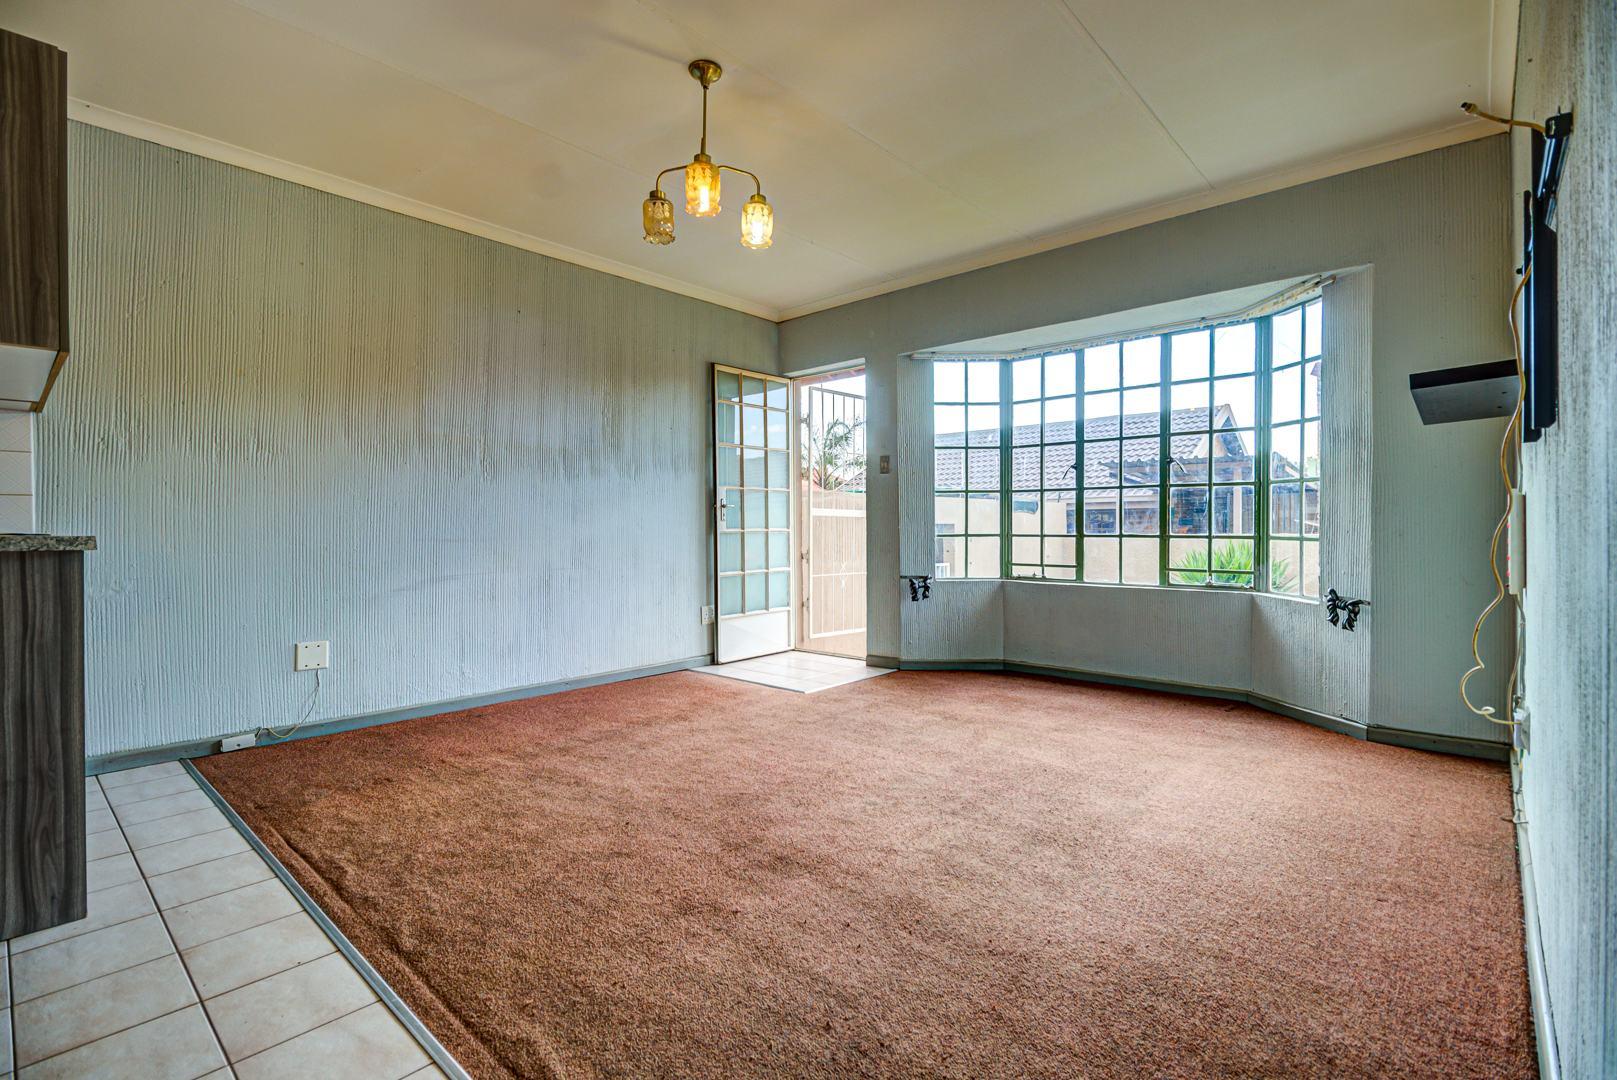 2 Bedroom Townhouse For Sale in Norkem Park